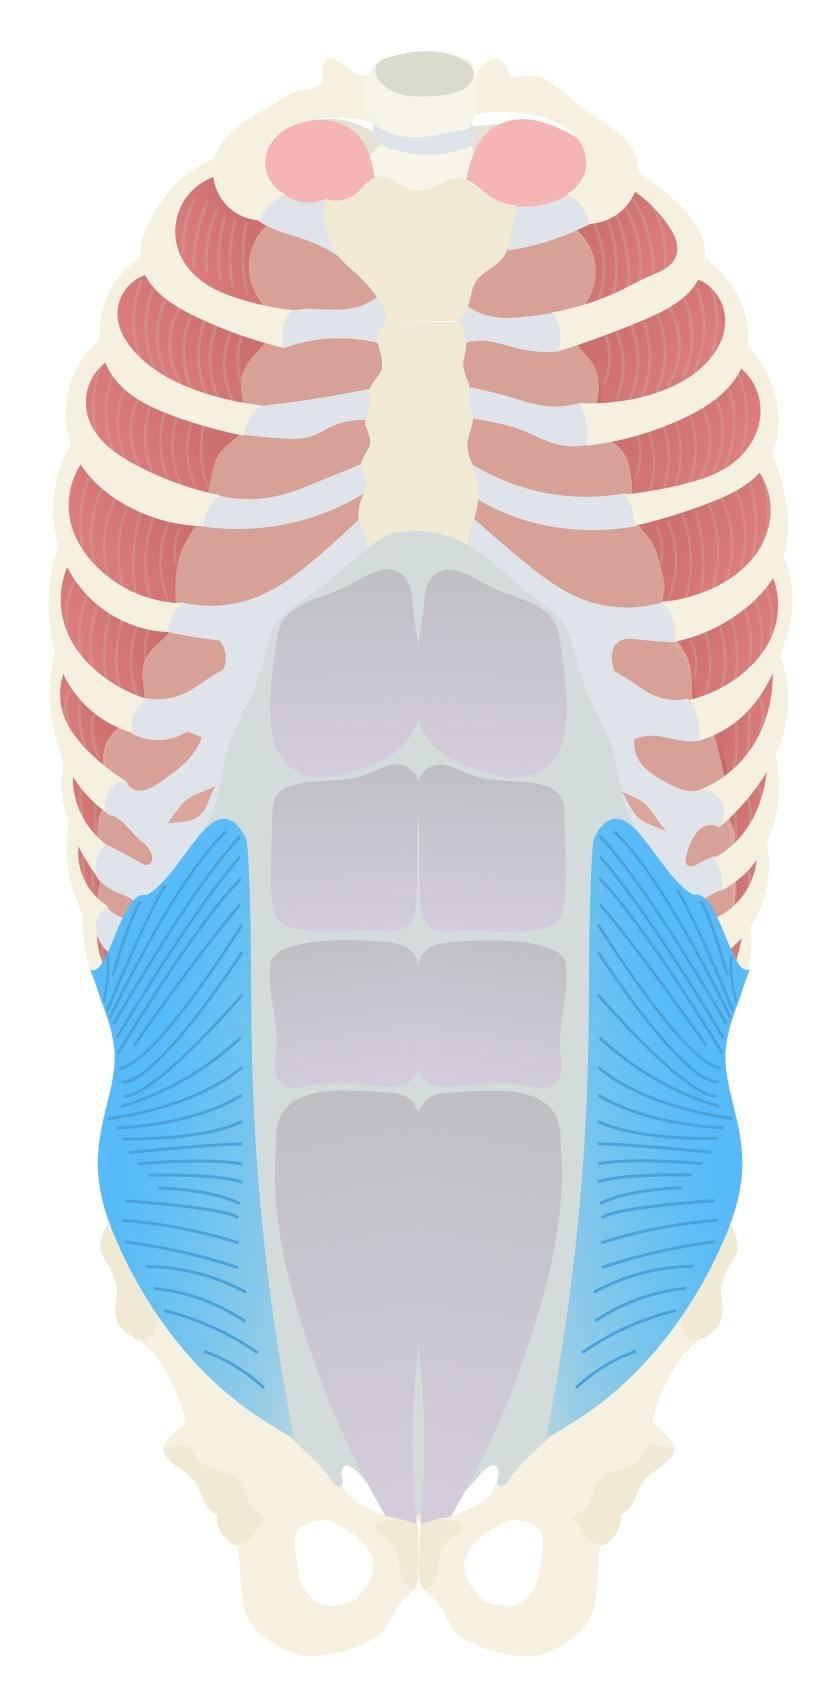 Internal oblique anatomy